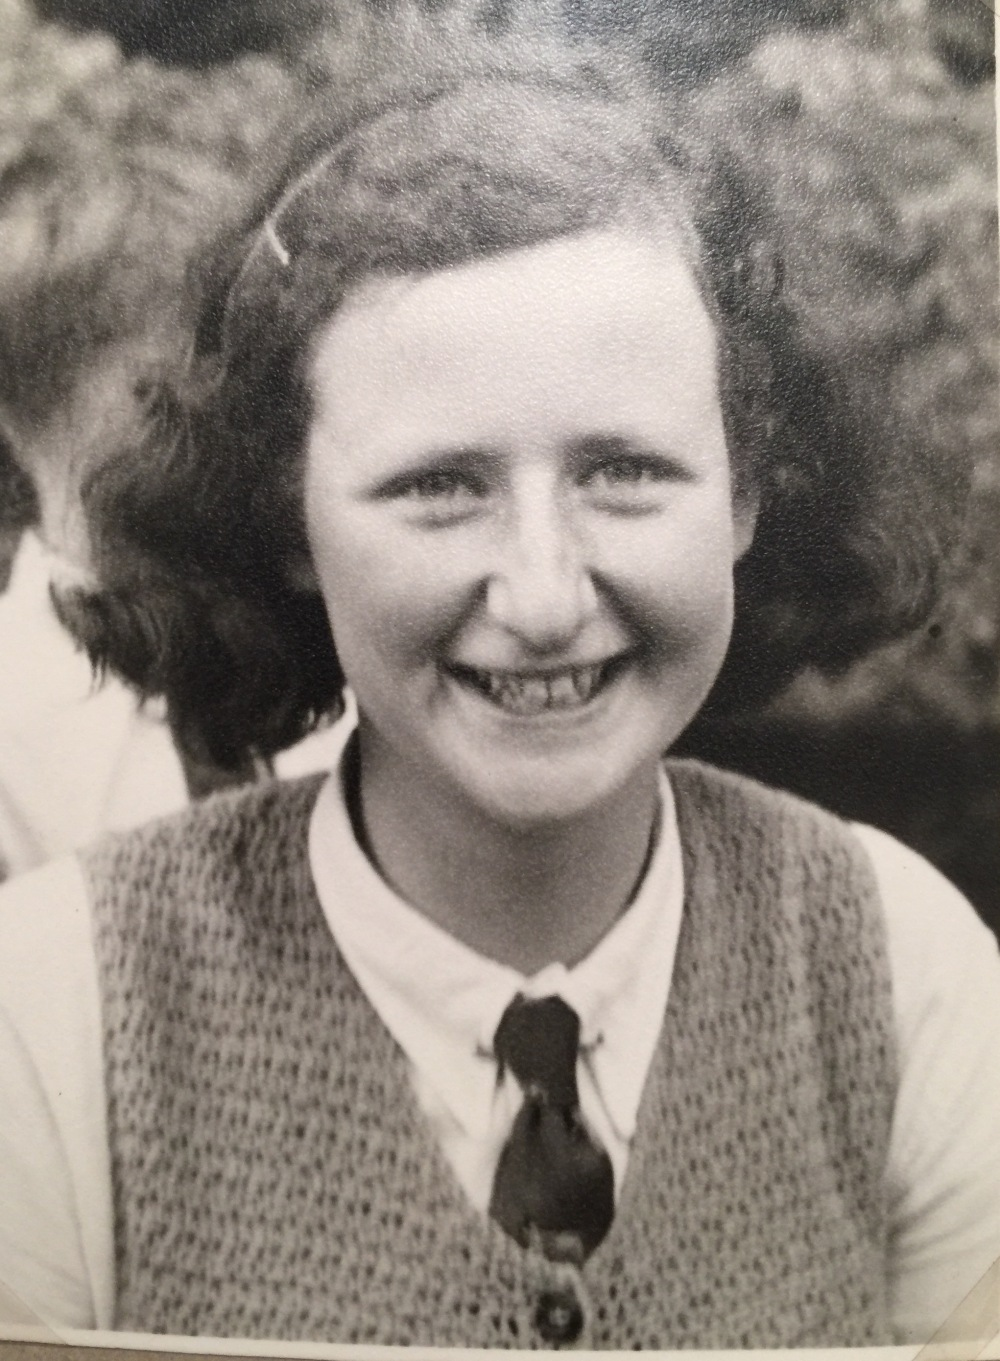 Rita Aged 18 - 1947 -